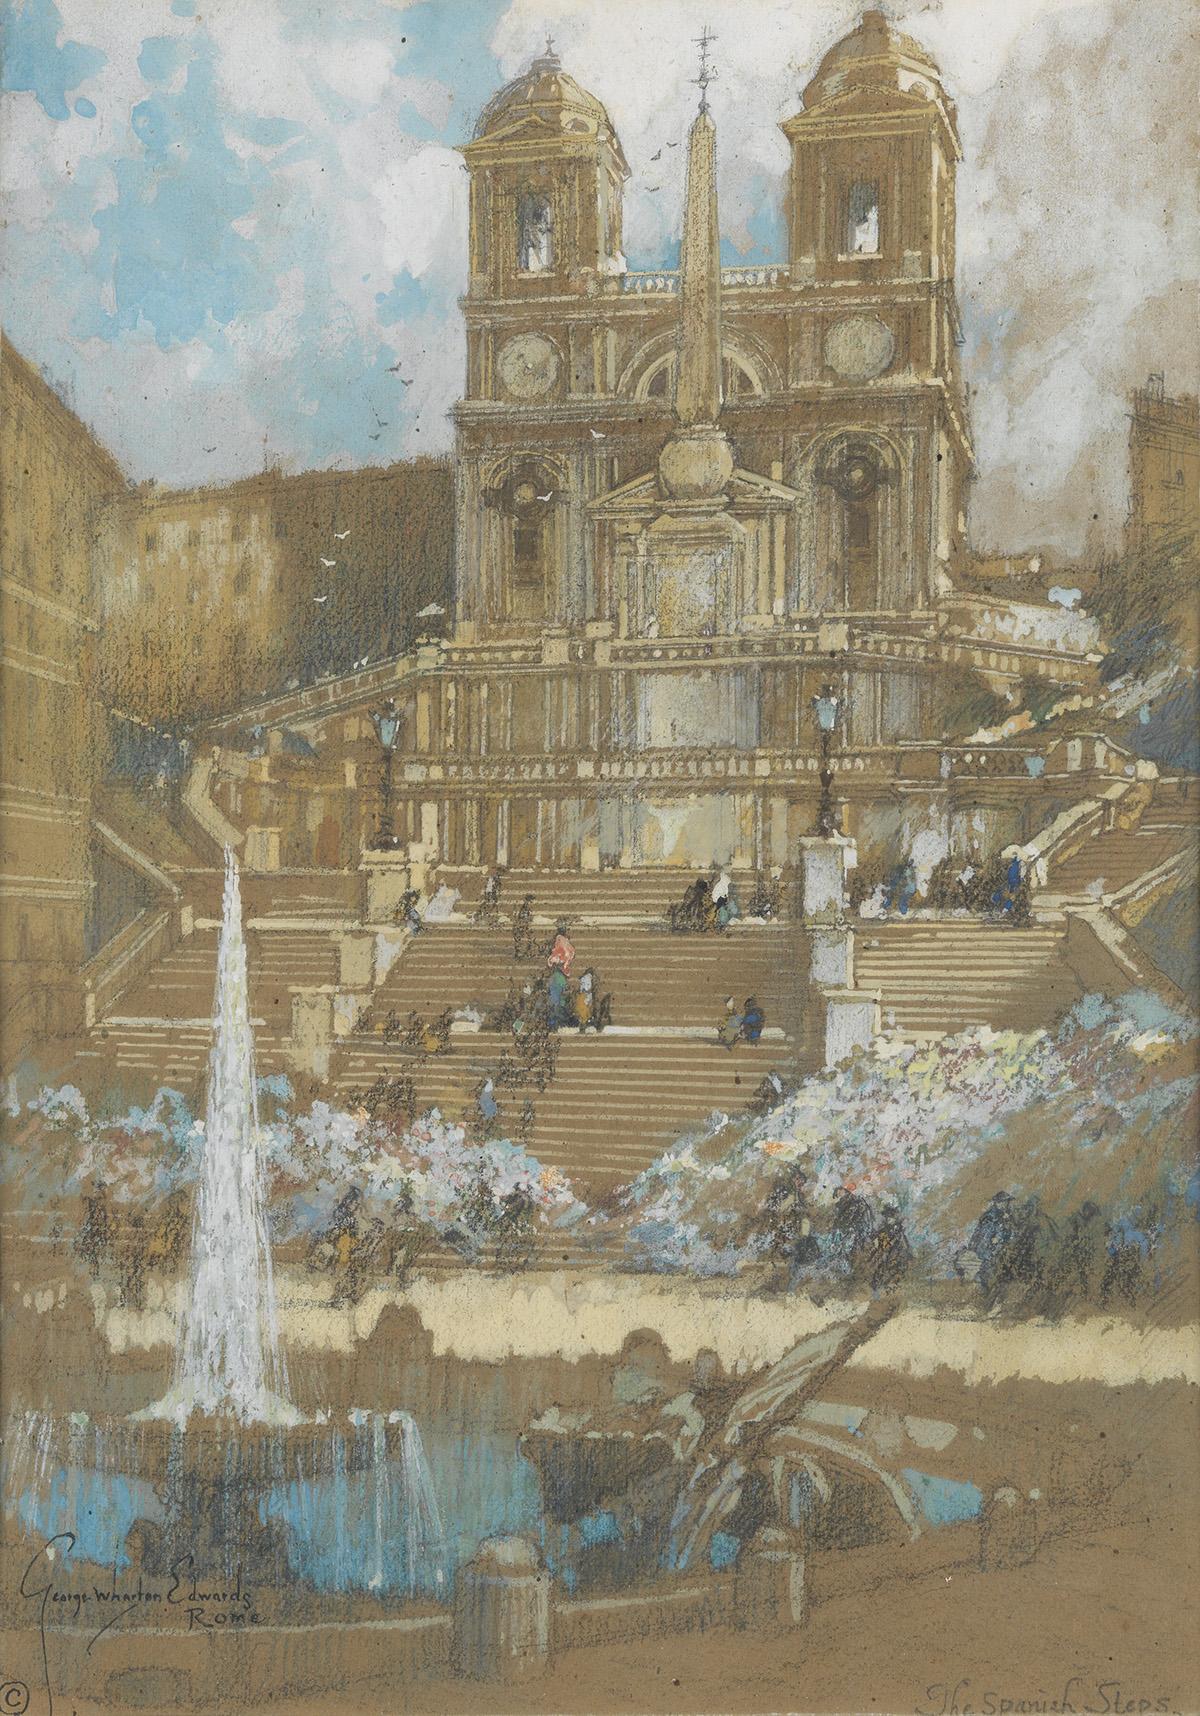 HARPERS ITALY GEORGE WHARTON EDWARDS. Leading up from the Piazza di Spagna to the Church of Santa Trinità de Monti.